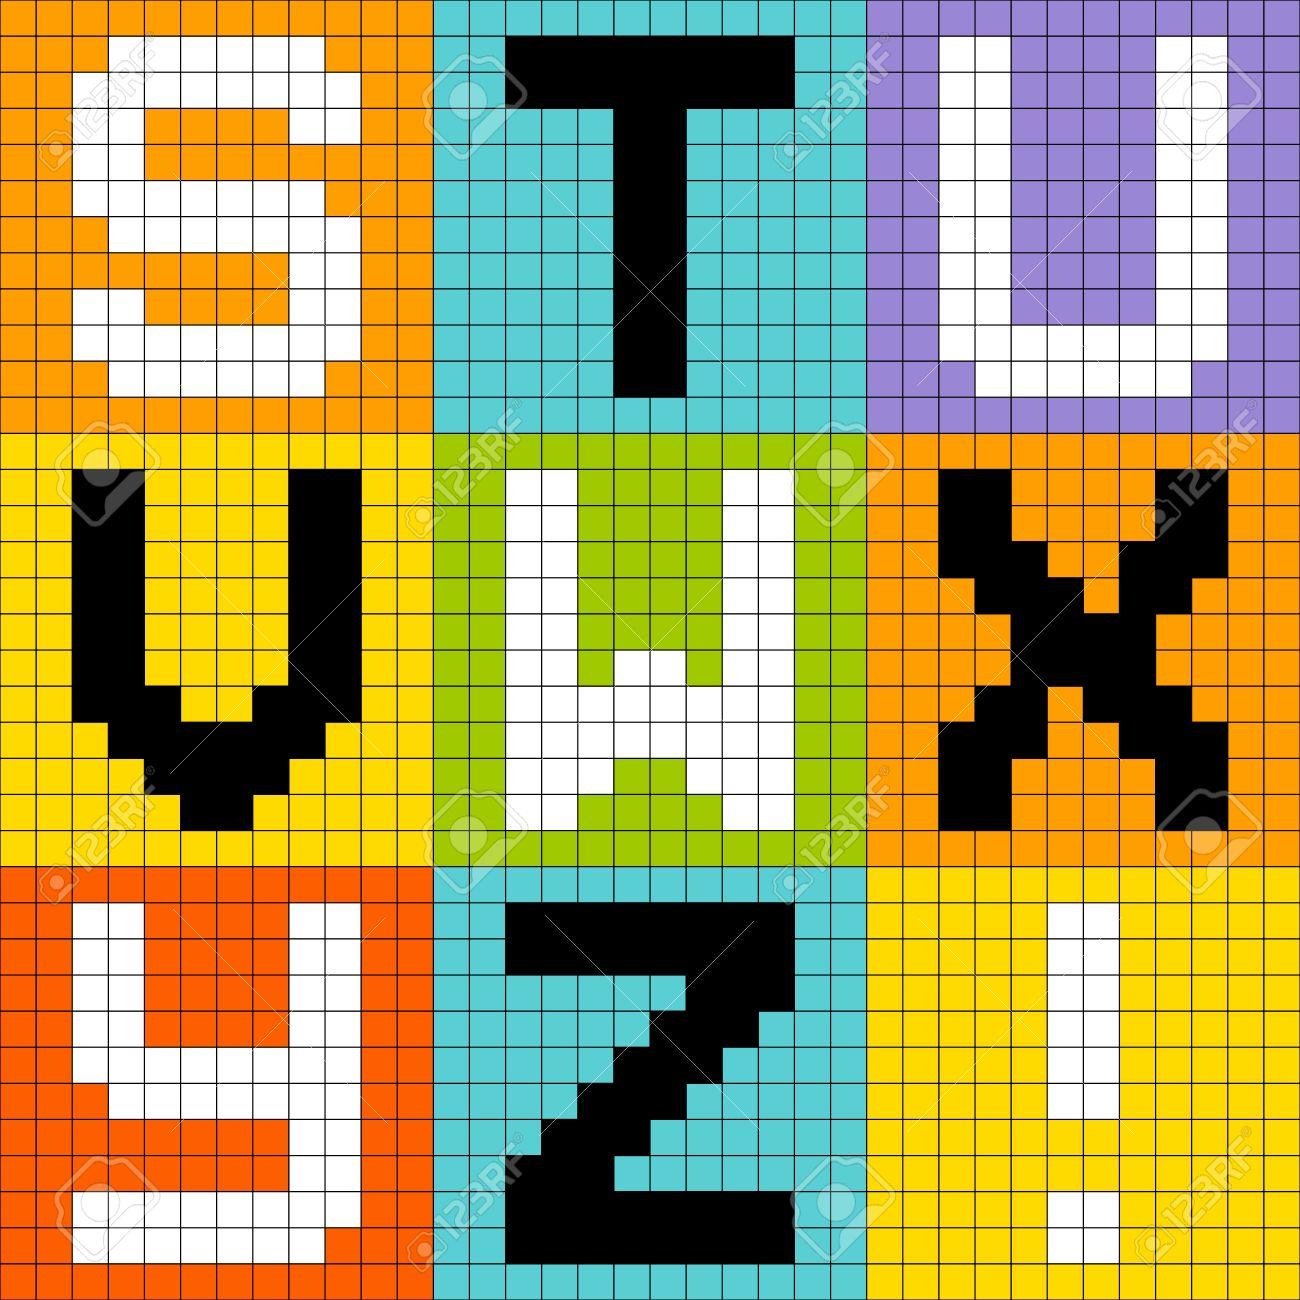 8-bit pixel-art letters STU VWX YZ Stock Vector - 20238535